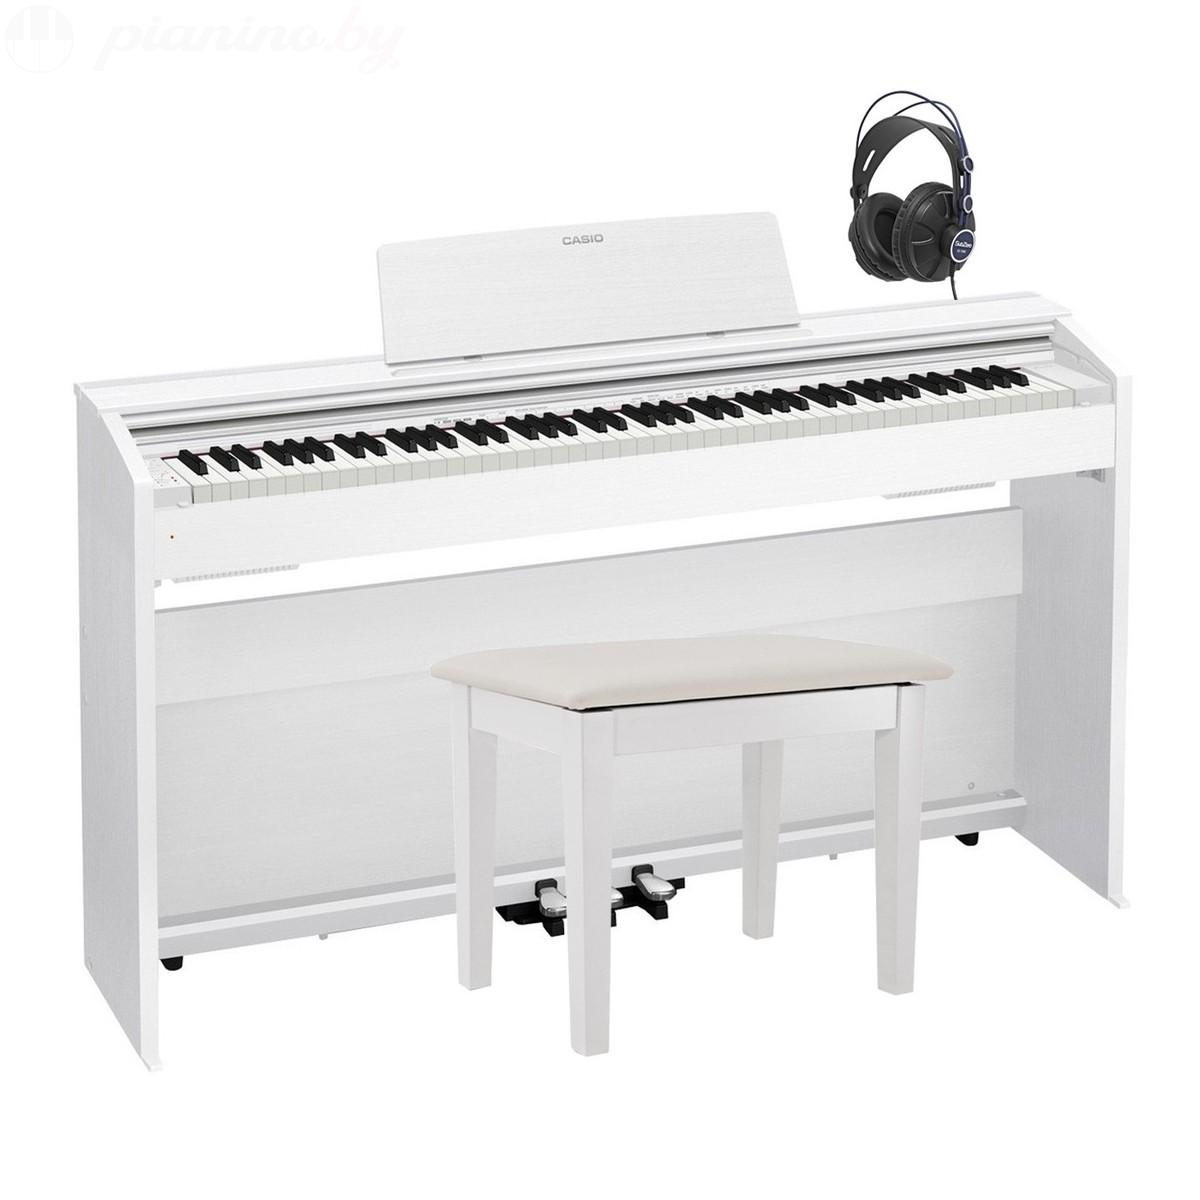 Цифровое пианино Casio Privia PX-870 White